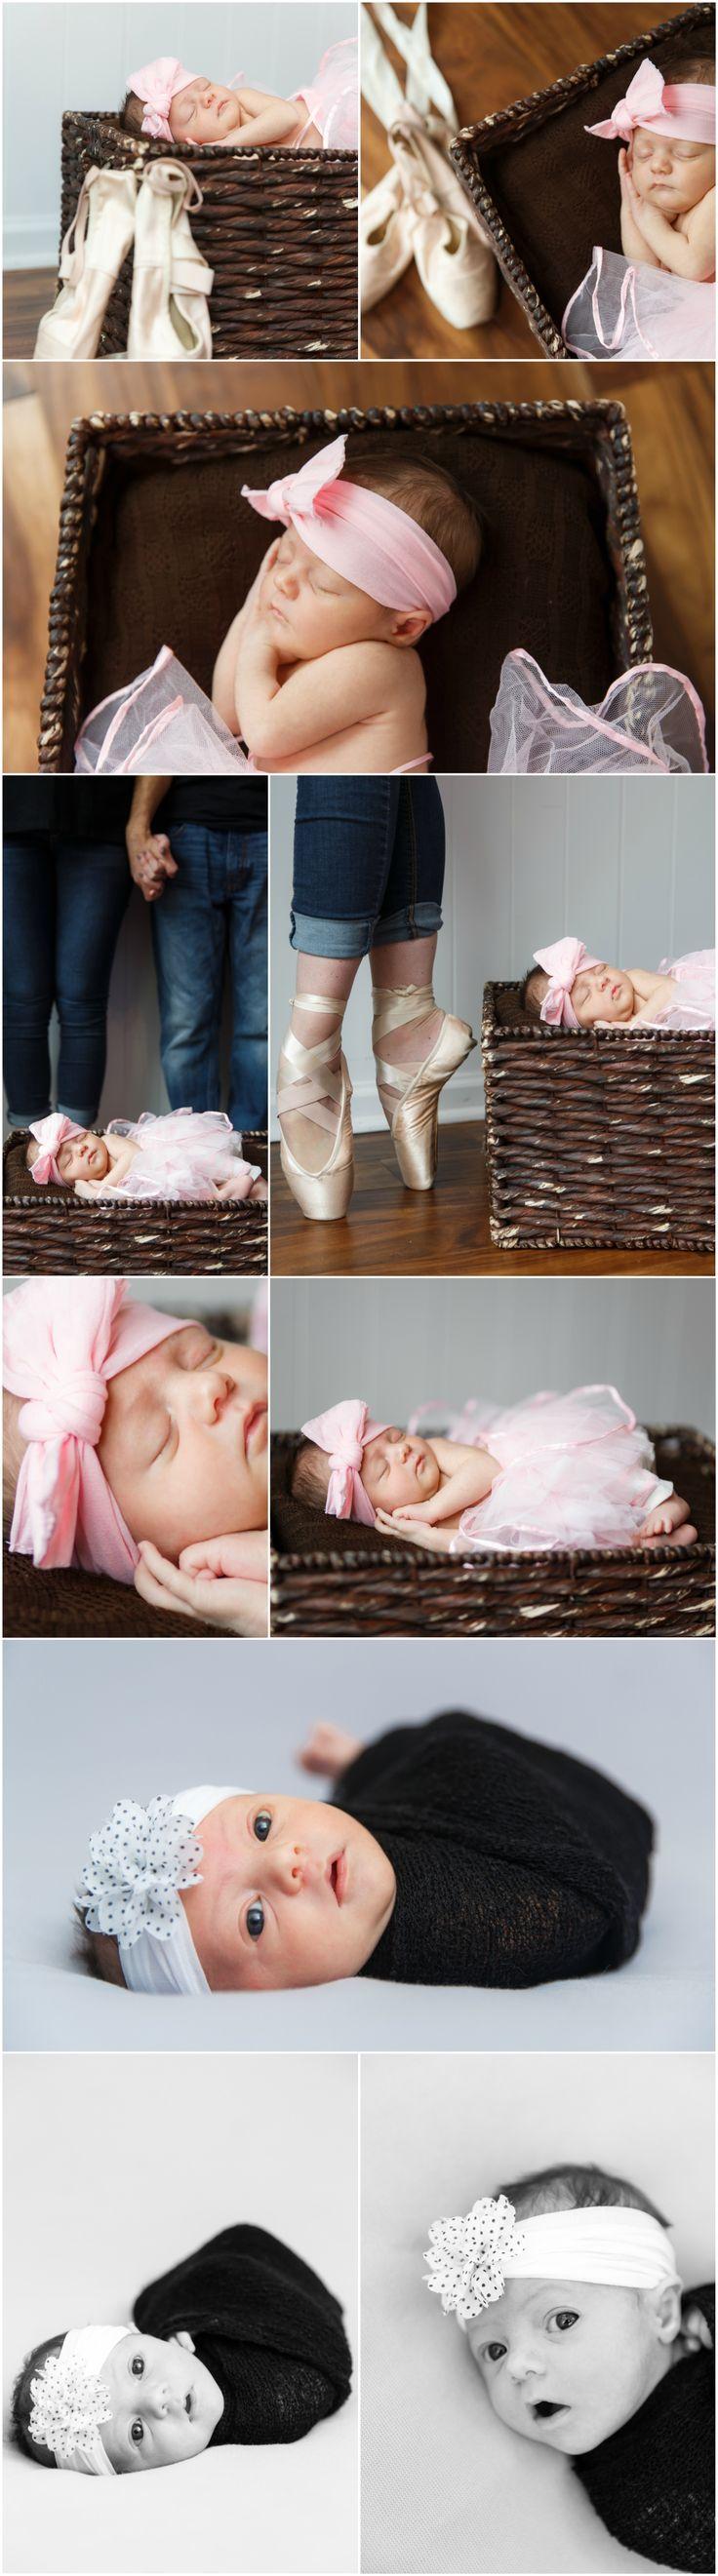 Newborn Photography Ideas and Inspiration   Newborn Poses   Denver Newborn Photographers   Newborn Ballerina Portraits